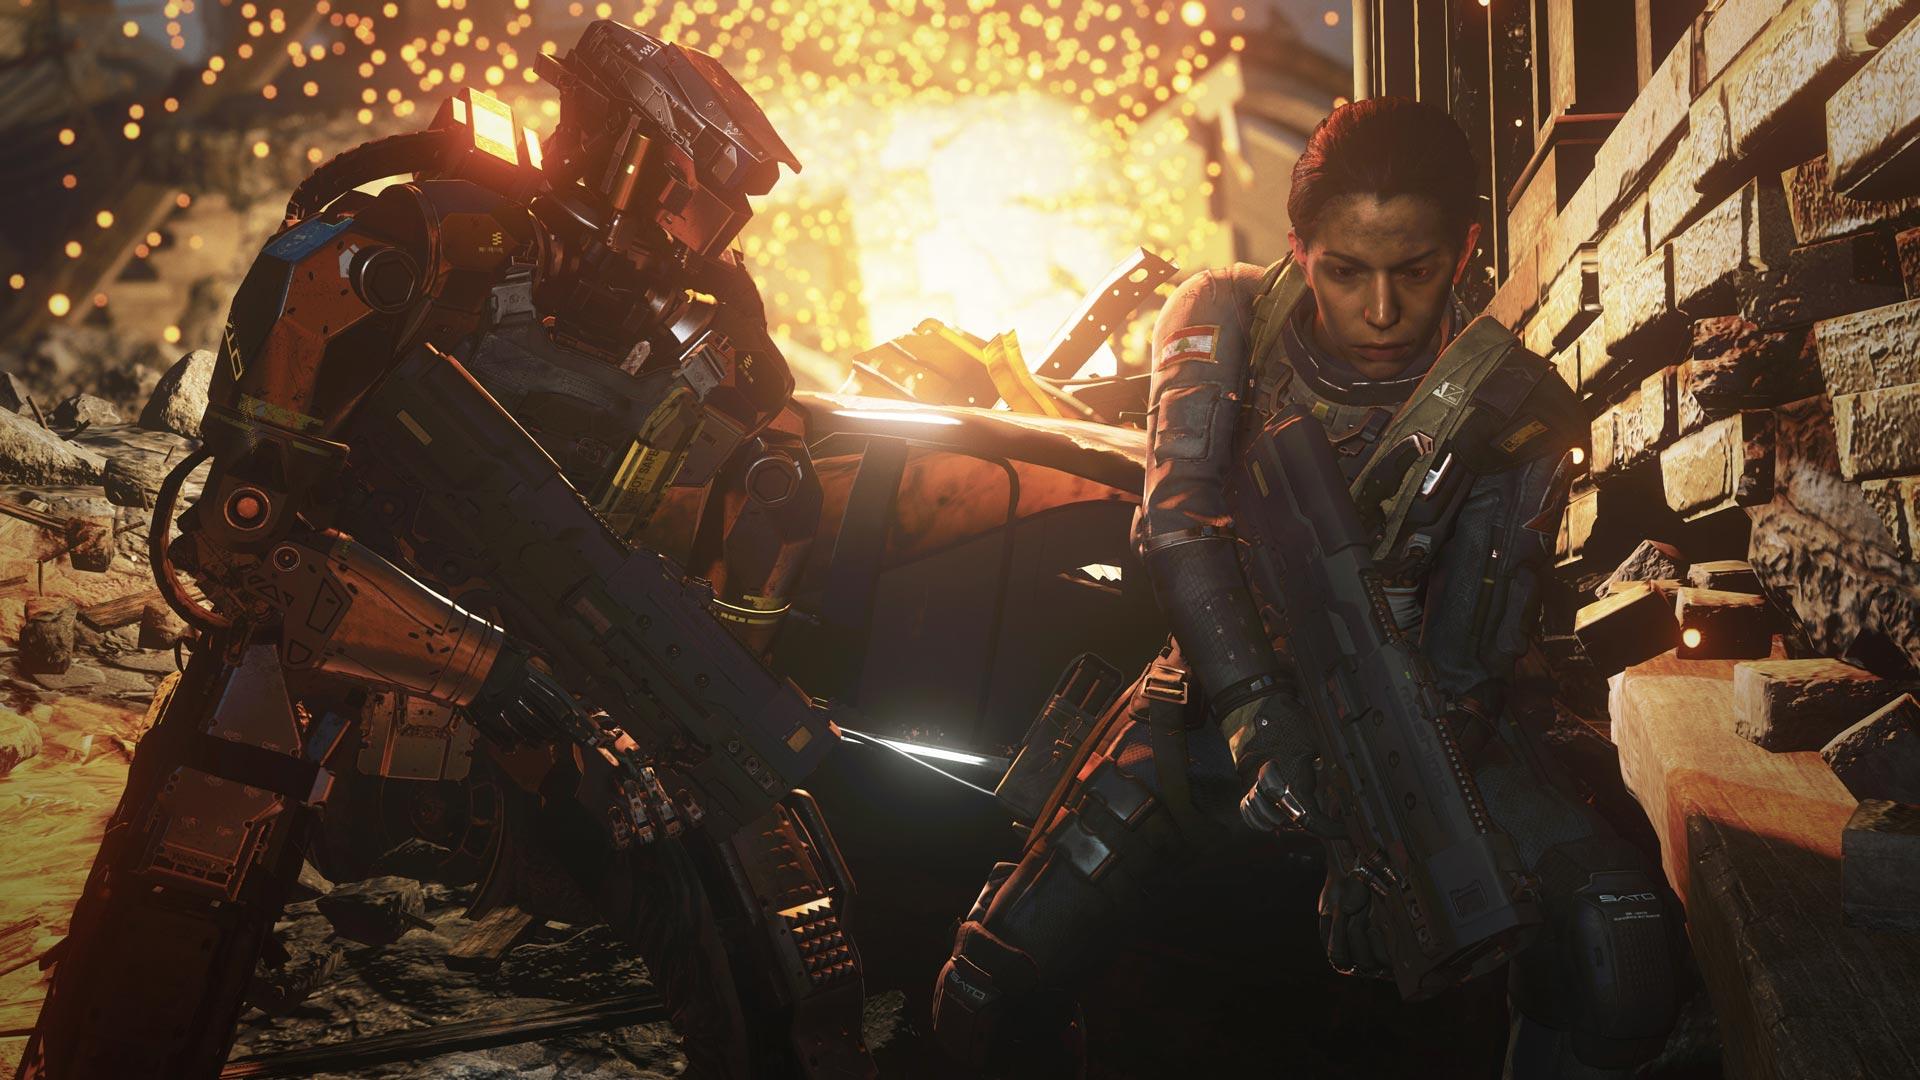 Call of Duty: Infinite Warfare Screenshot 1